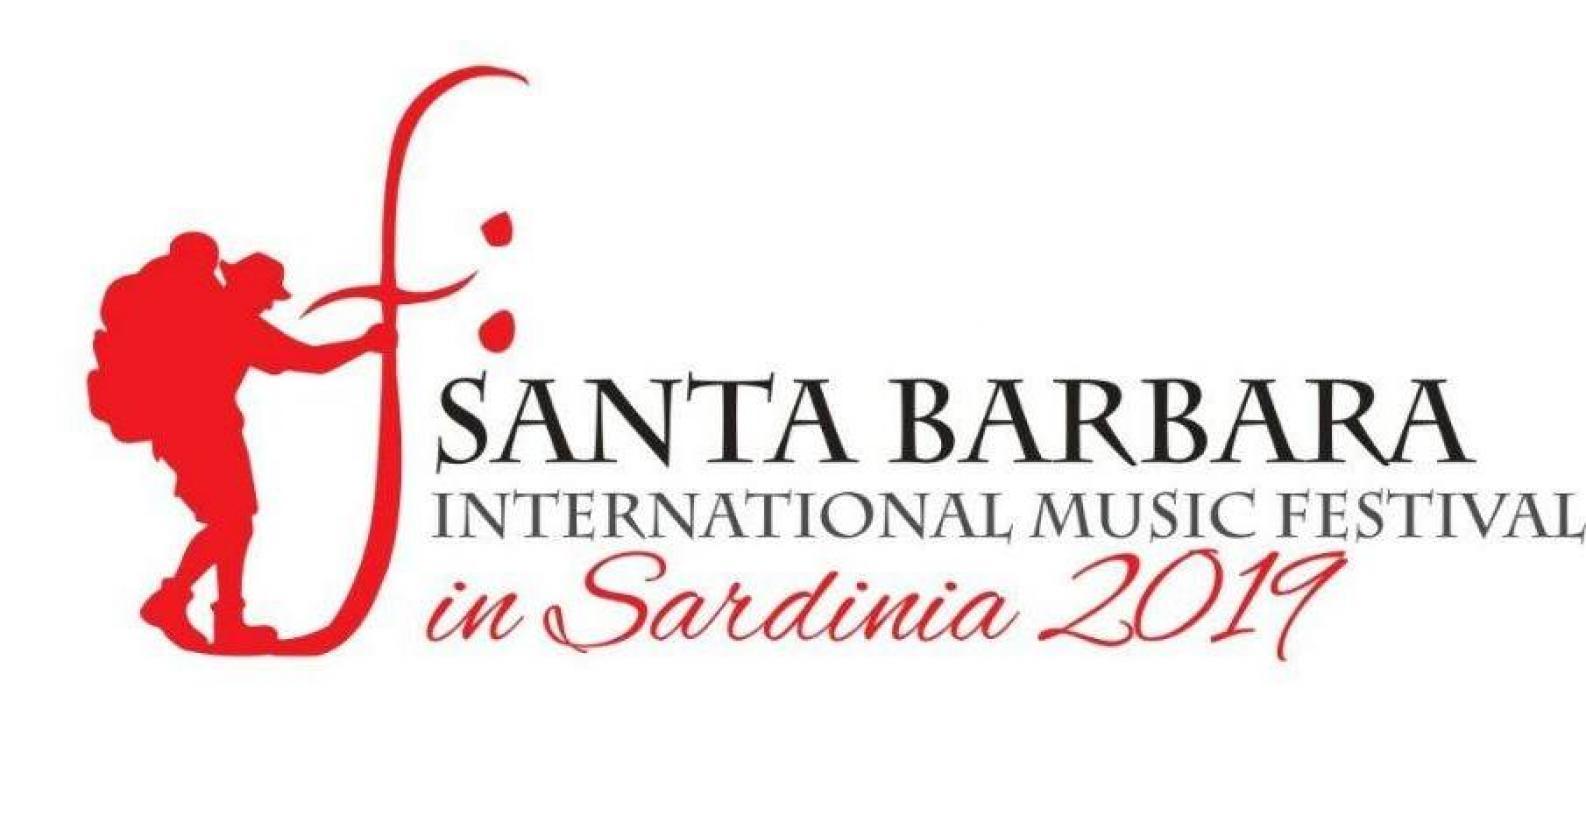 Santa Barbara Festival